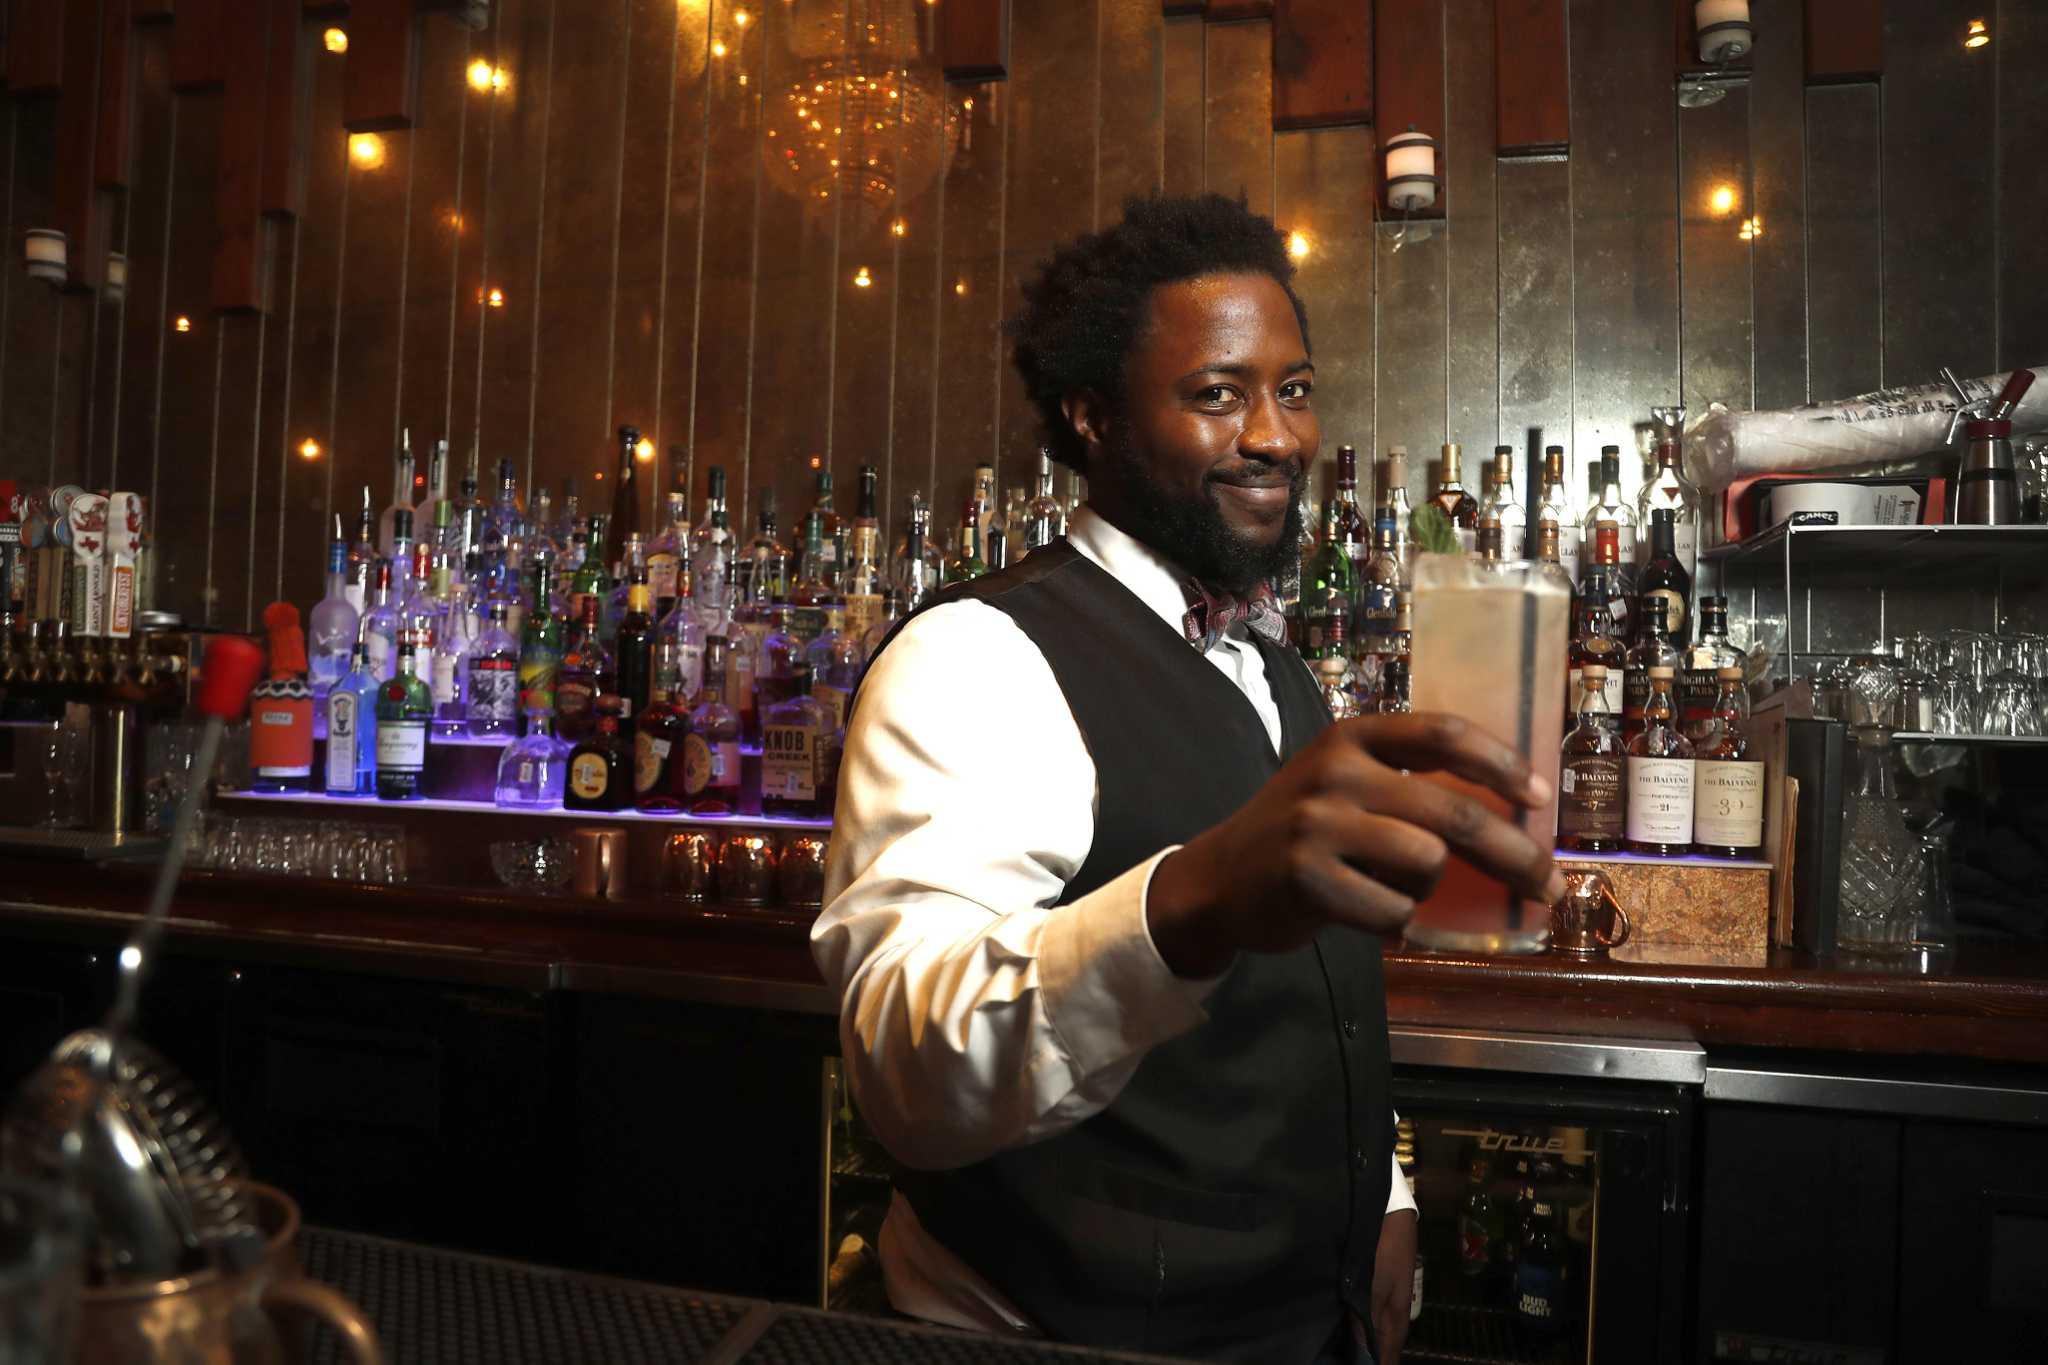 Pickup Secrets from Bartenders Pickup Secrets from Bartenders new images